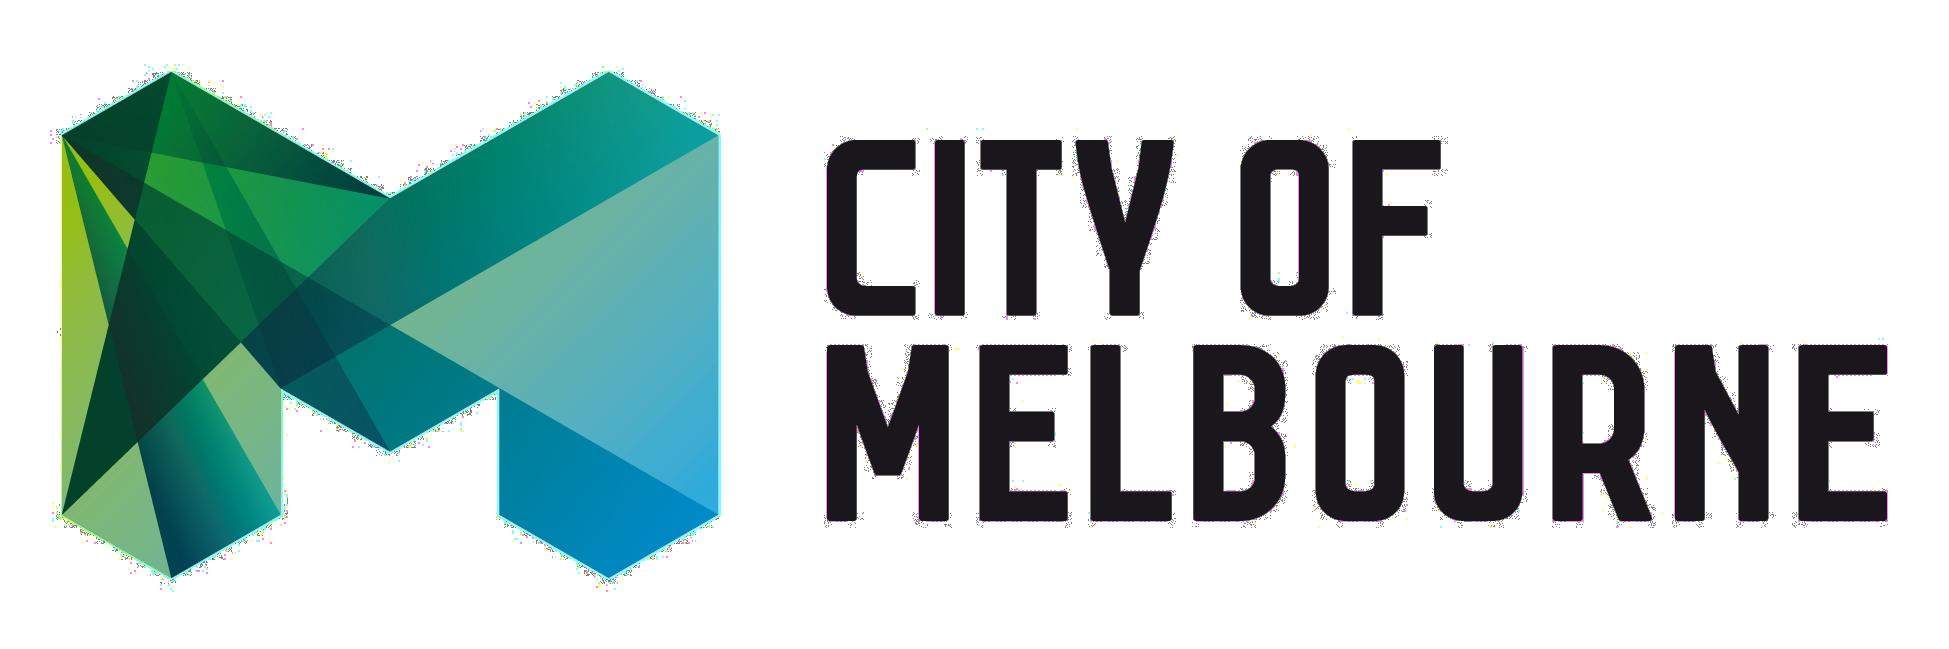 City of Melbourne LoRaWAN IoT